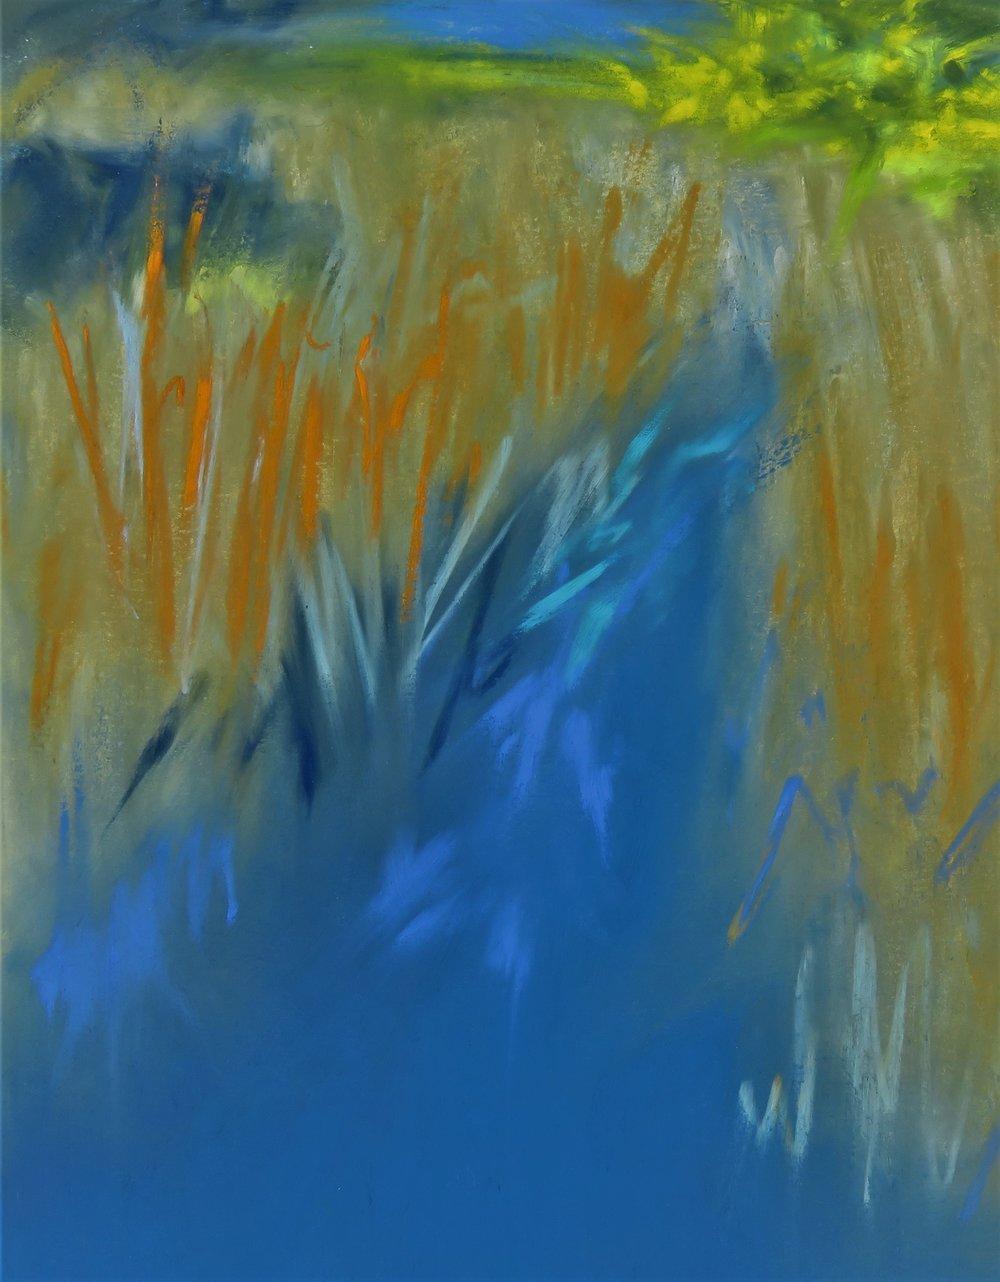 Reed Beds - Slapton Ley (SOLD)